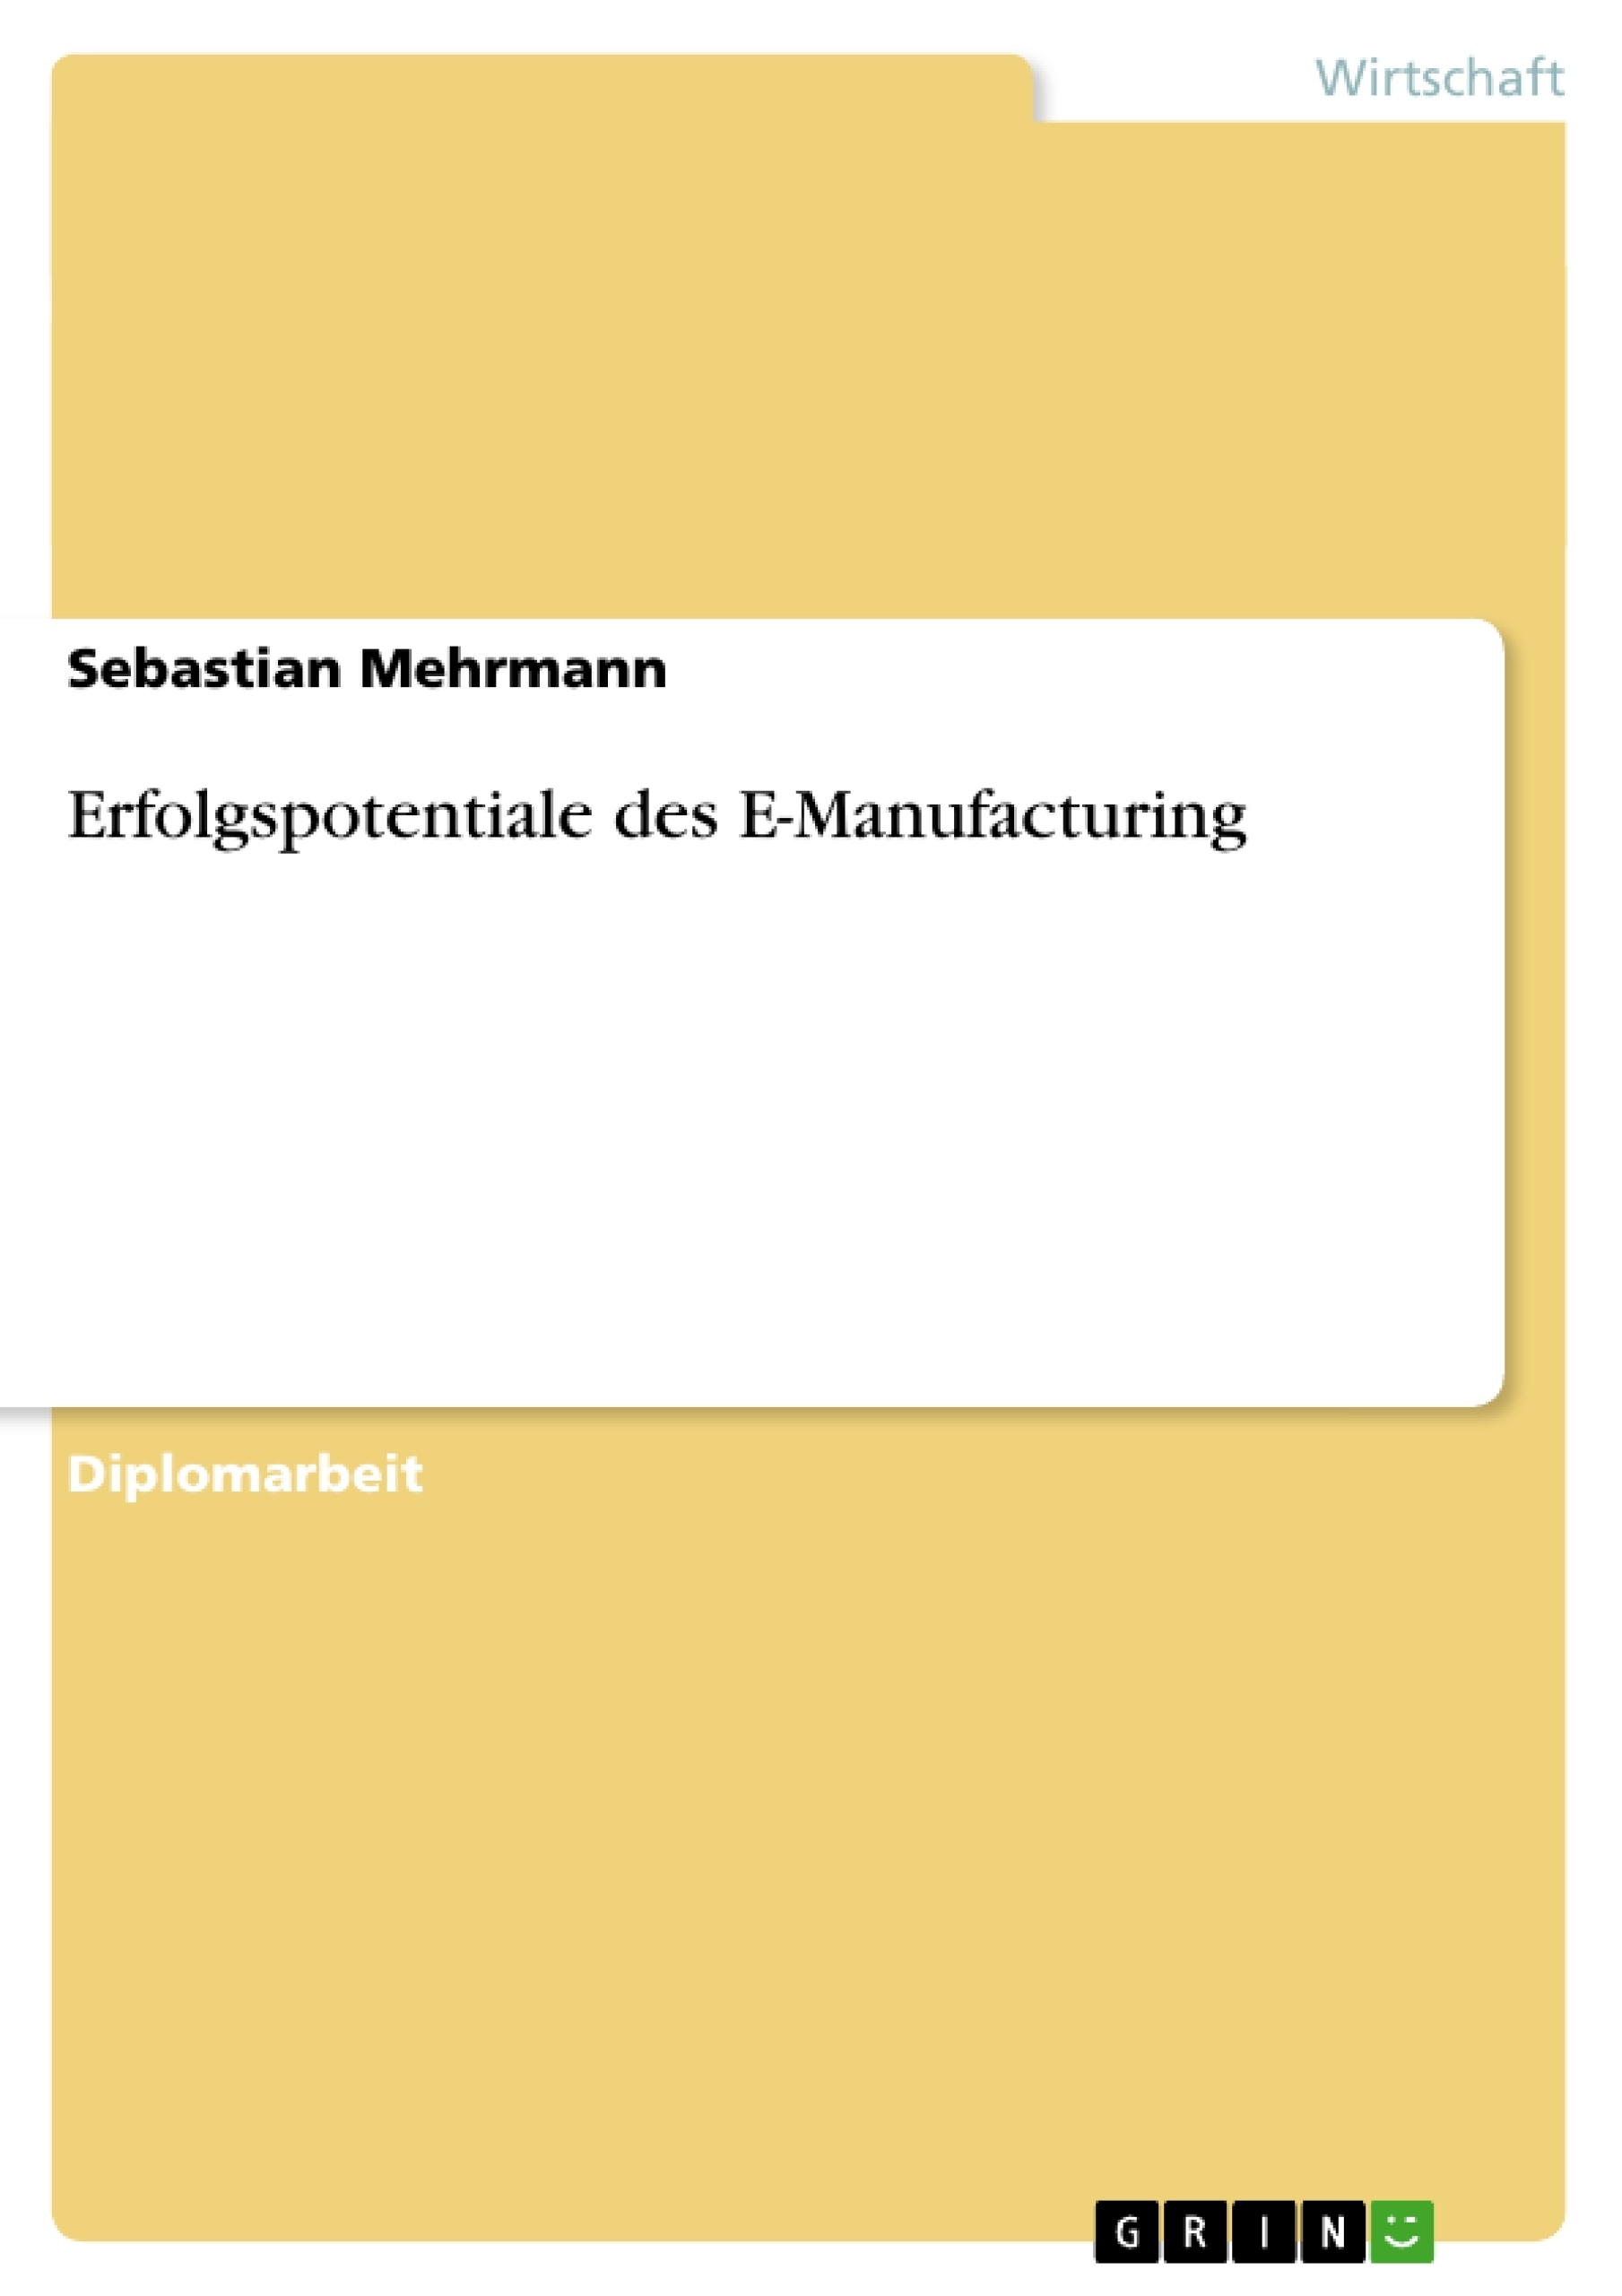 Titel: Erfolgspotentiale des E-Manufacturing